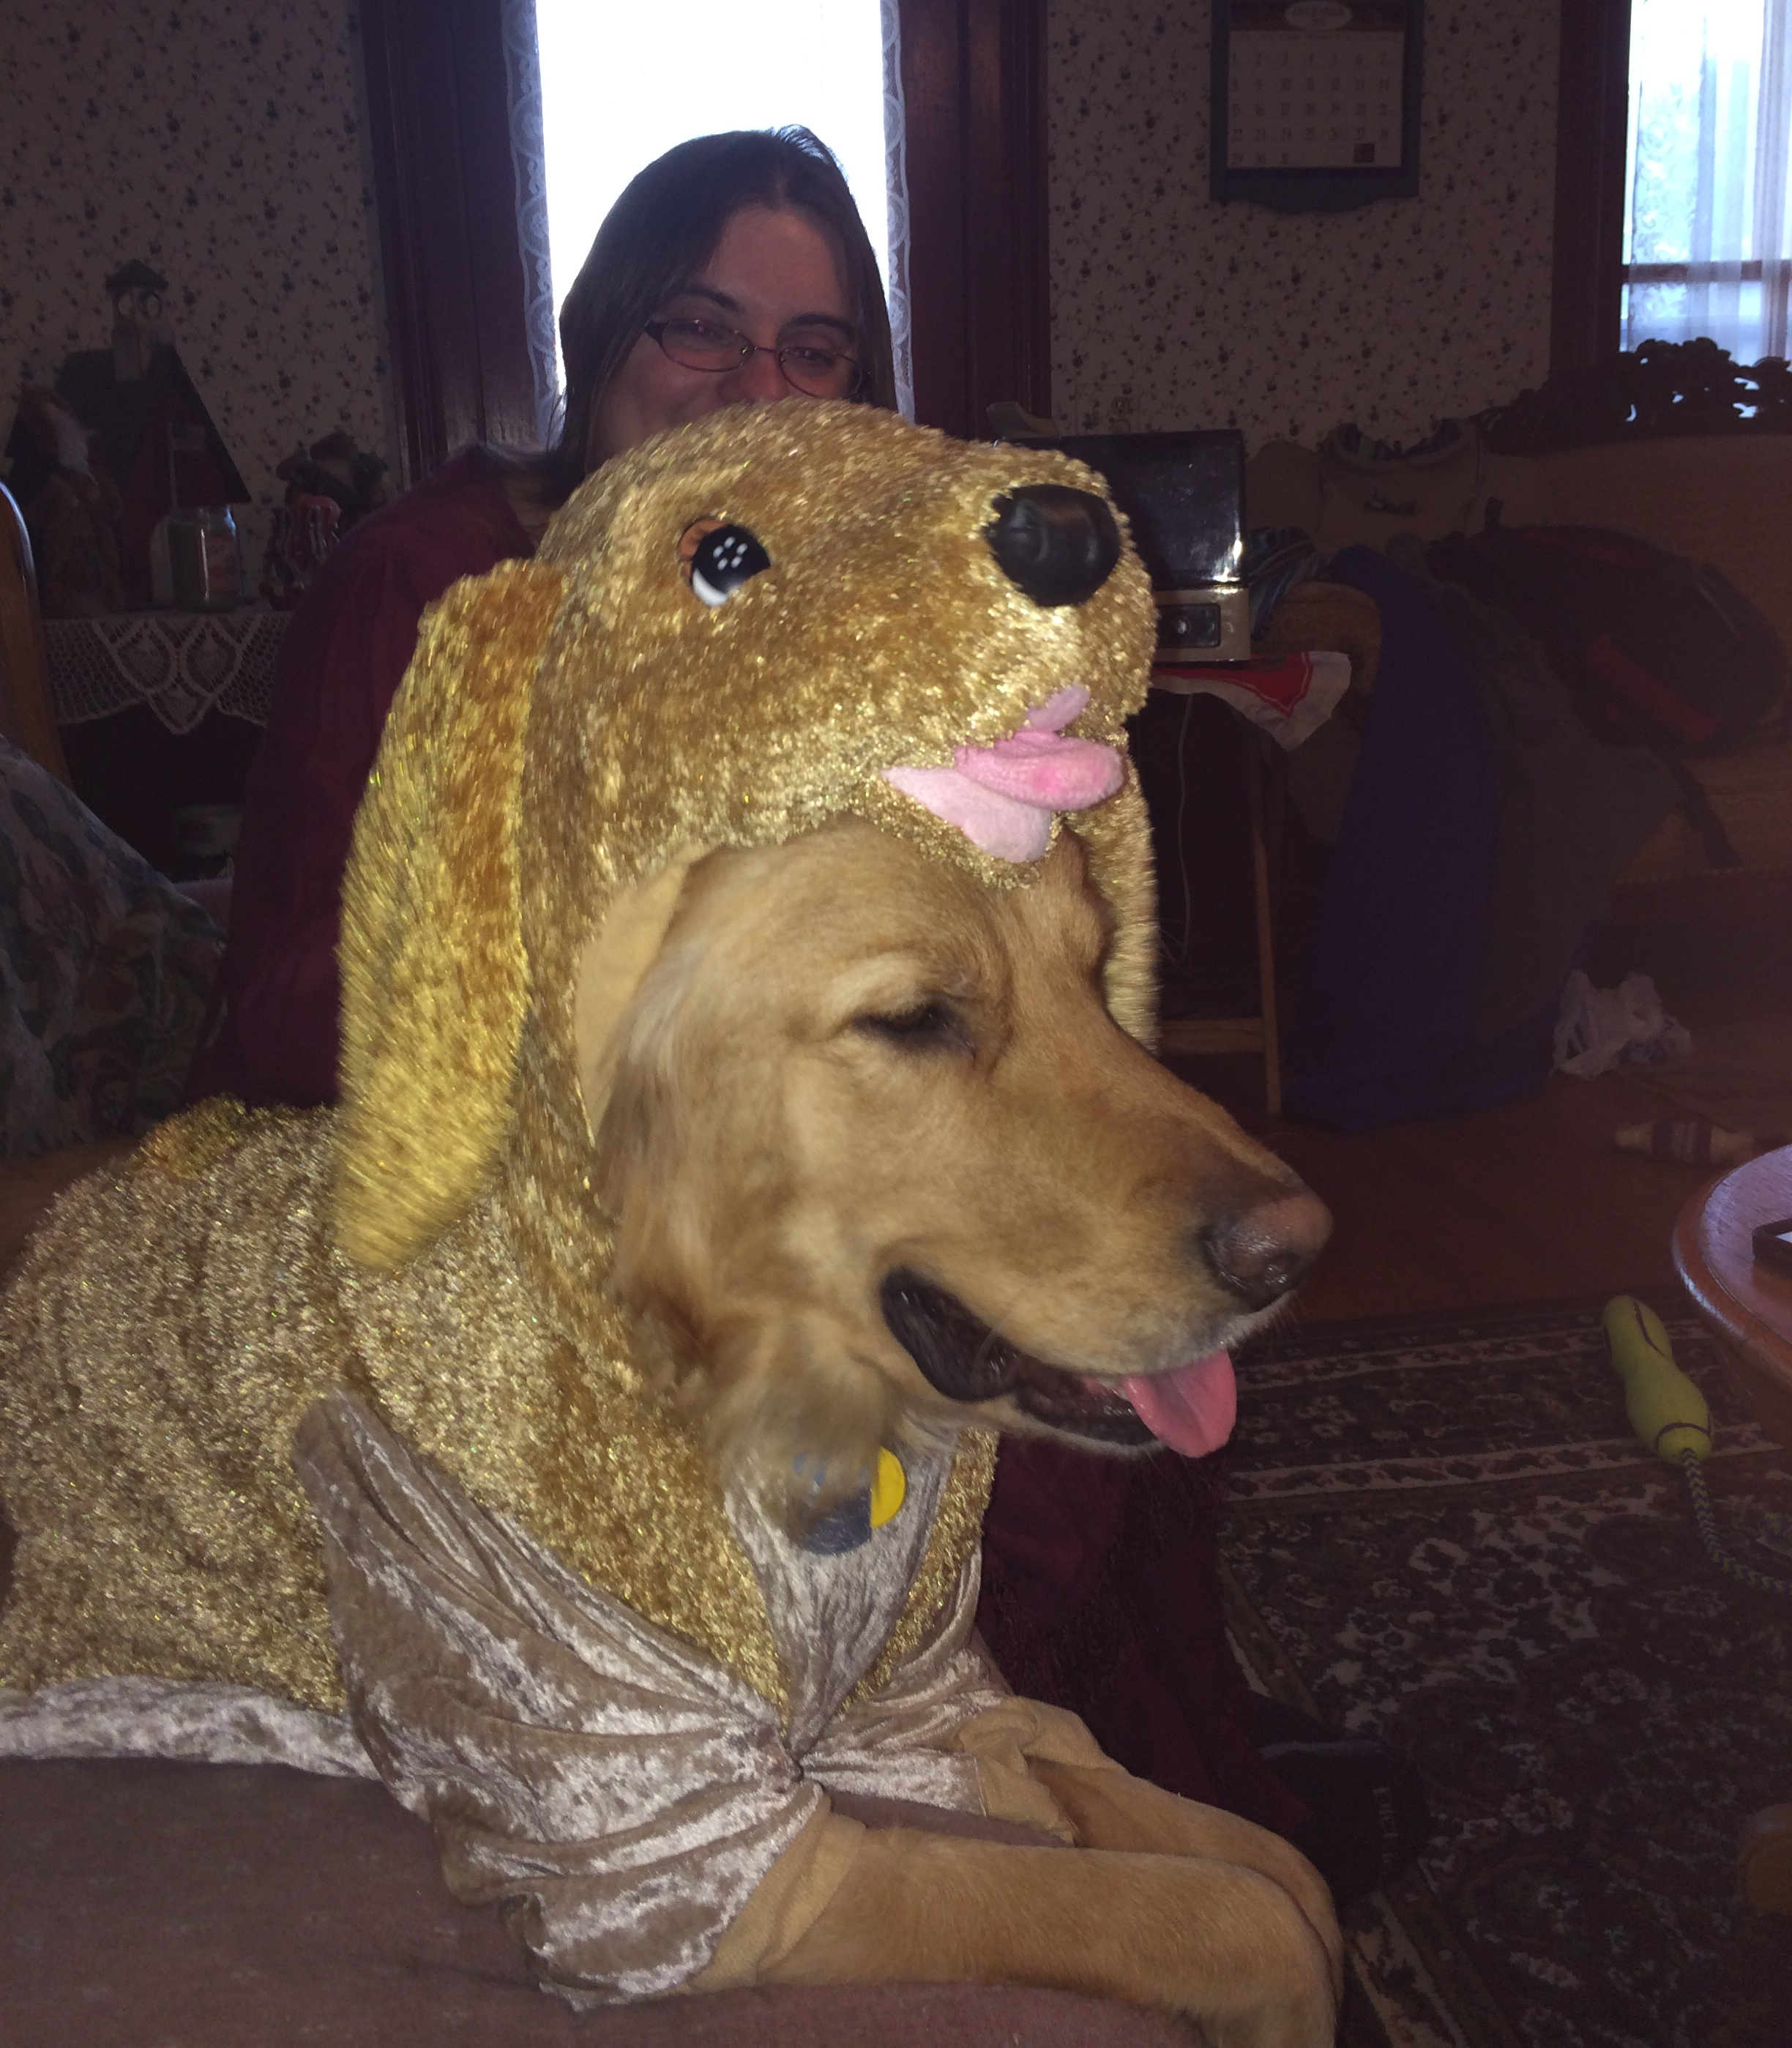 Golden Retriever Dressed in a Golden Retriever Costume